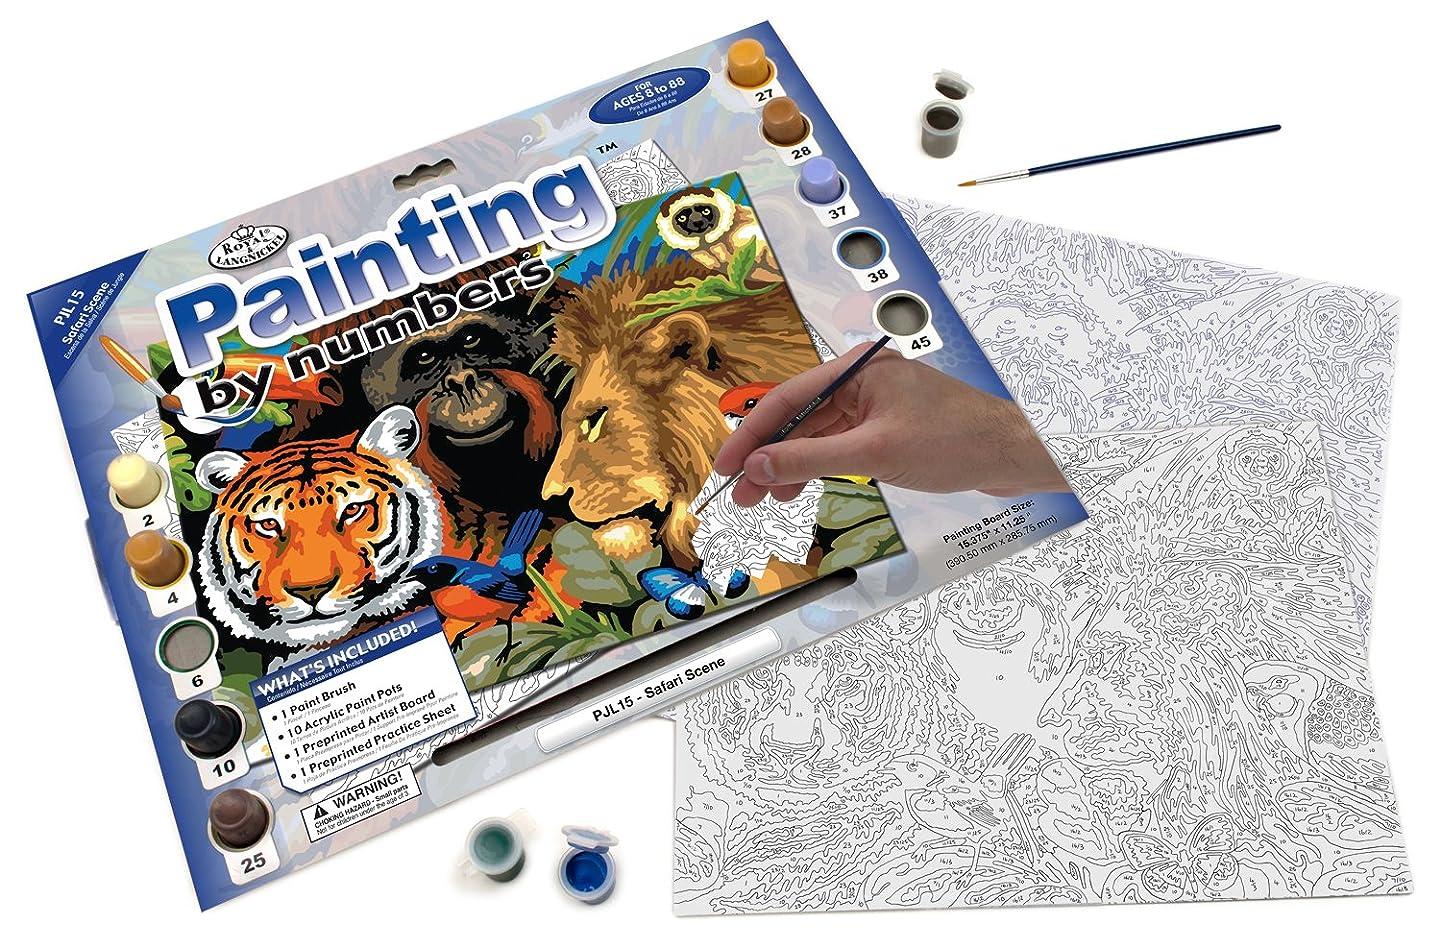 Royal & Langnickel Painting by Numbers Junior Large Art Activity Kit, Safari Scene